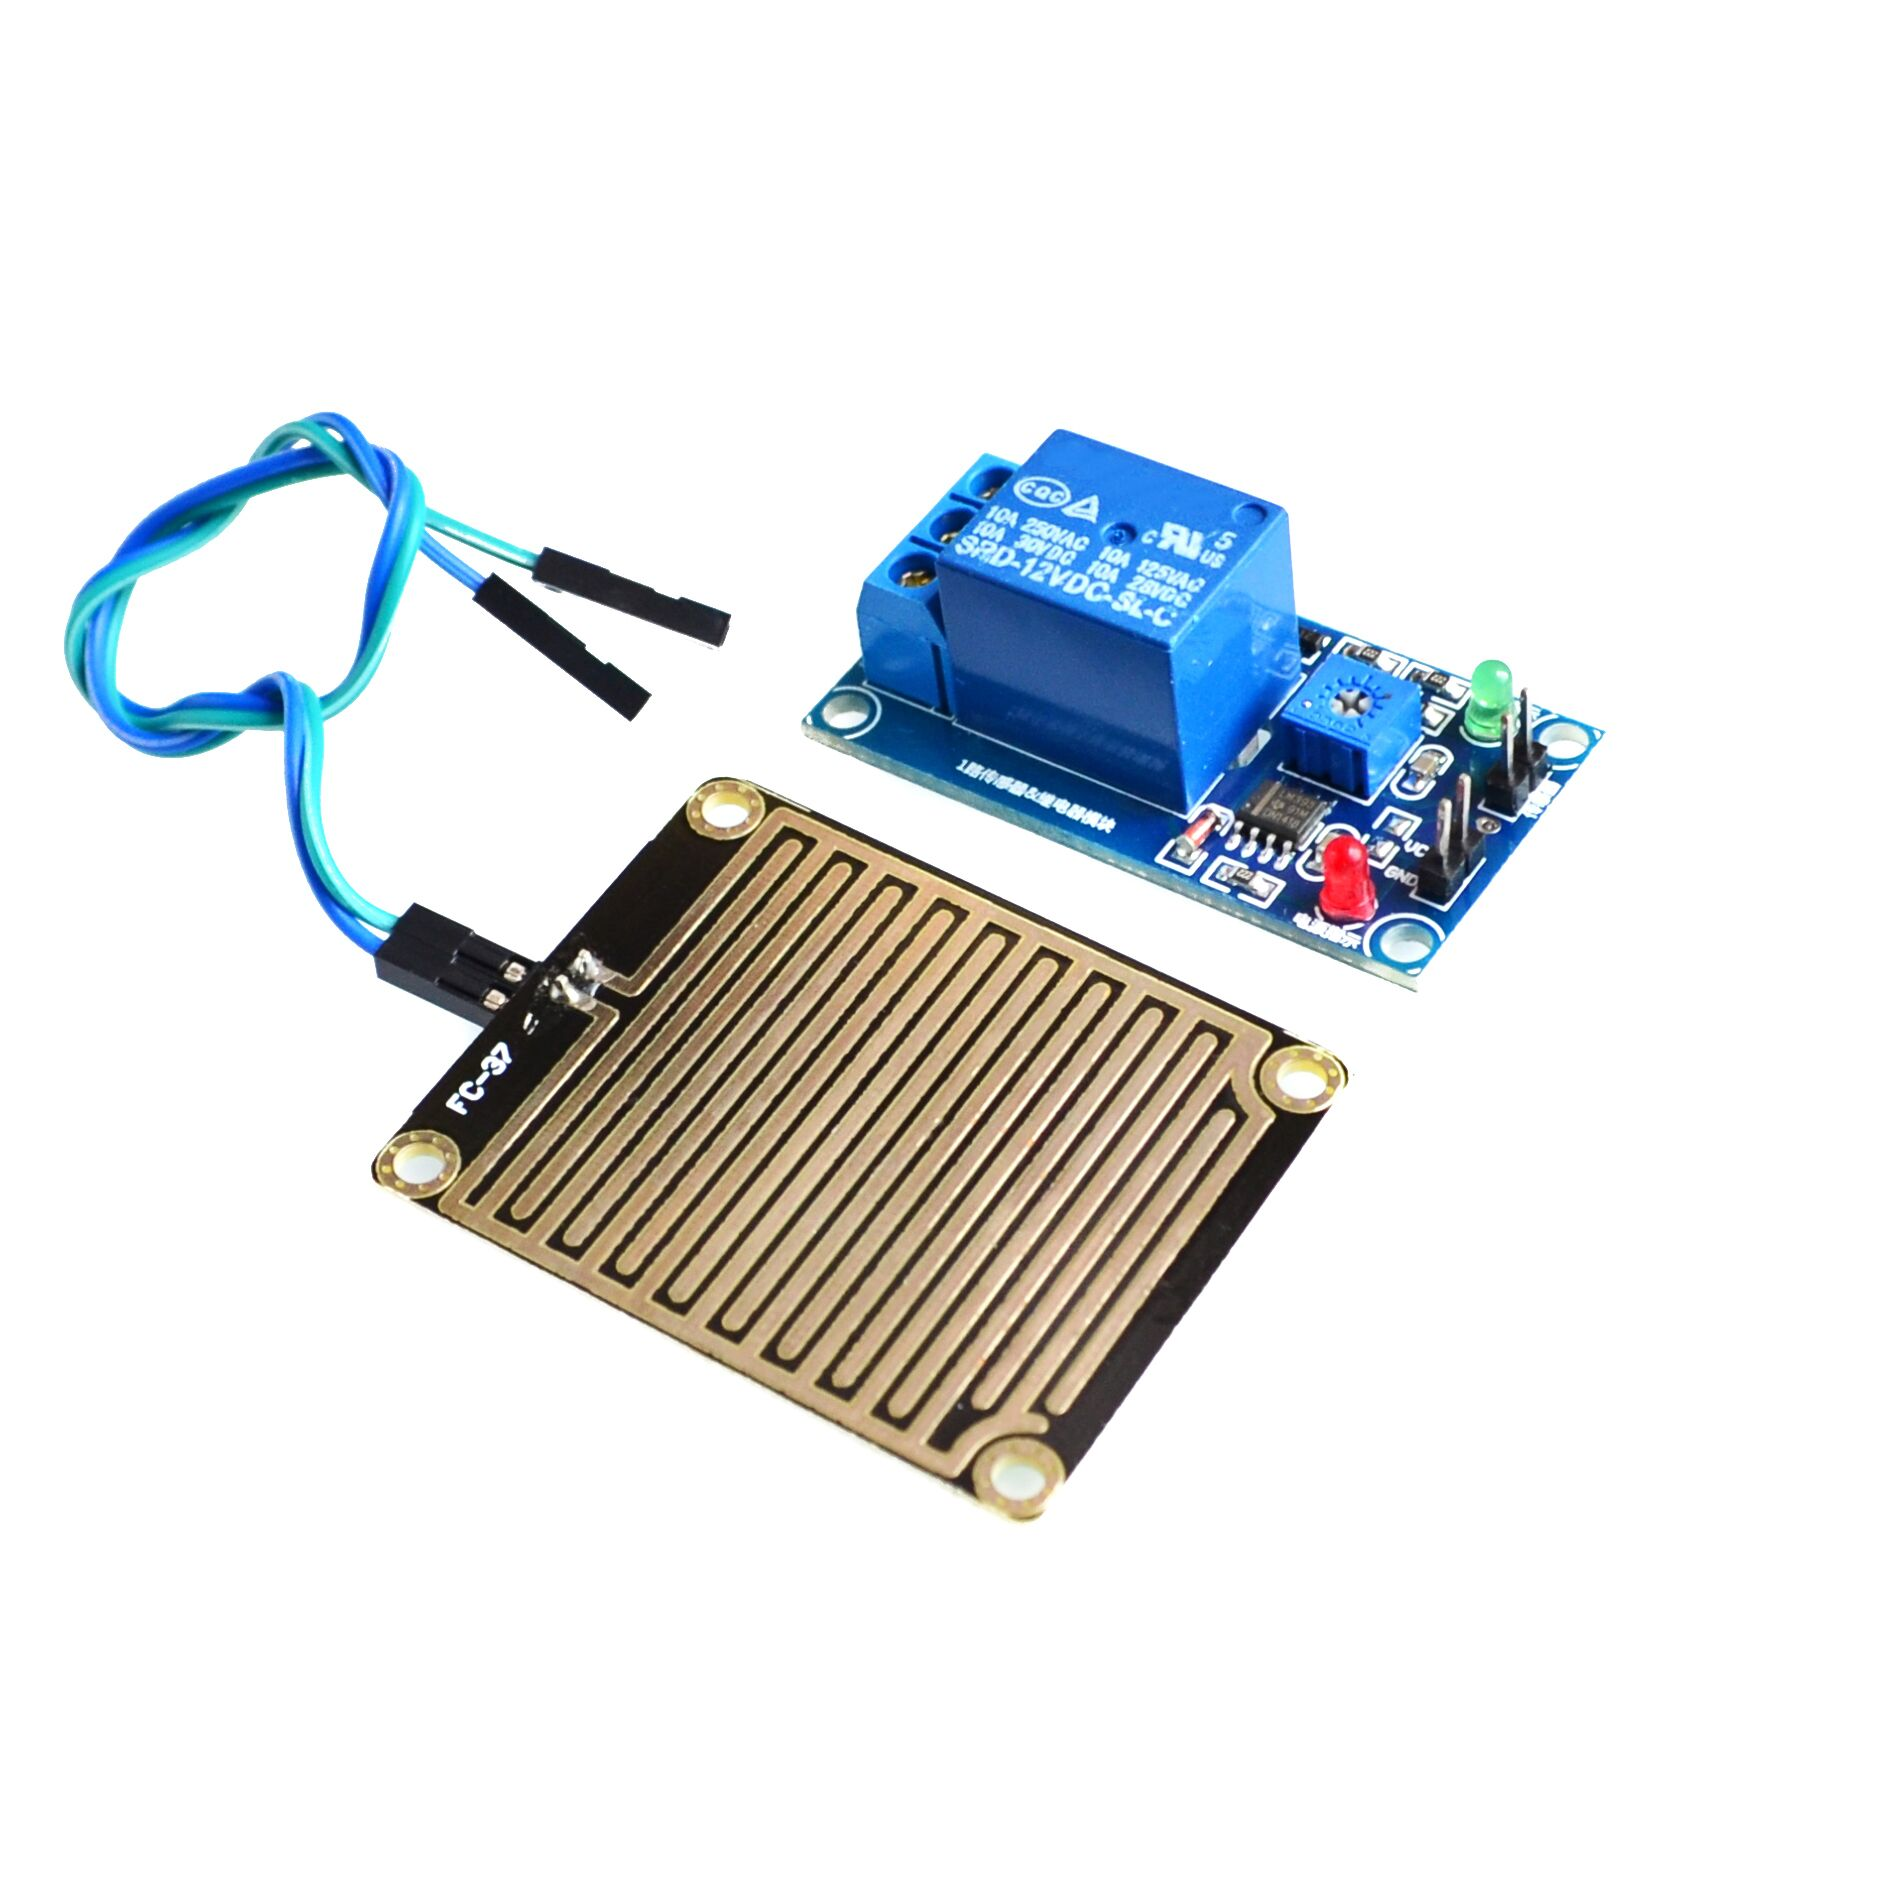 Reasonable Rain Water Sensor Module Dc 5v Relay Control Module Rain Sensor Water Raindrops Detection Module For Arduino Robot Kit 5pcs Electronic Components & Supplies Integrated Circuits